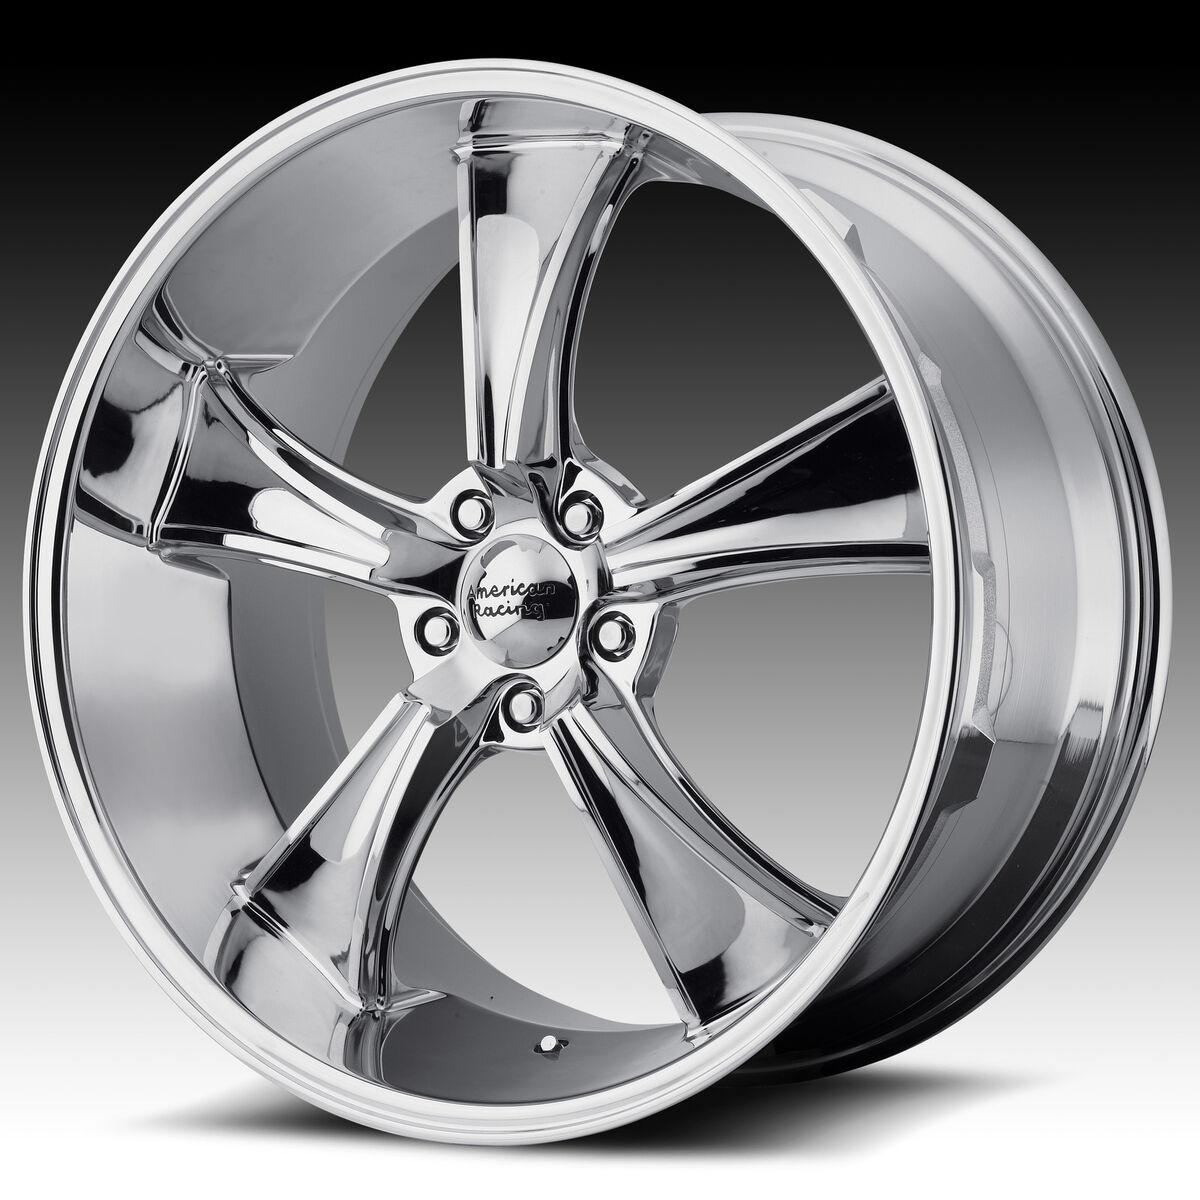 17 VN805 Blvd American Racing Wheels Rims Torq Chevy Ford Dodge Chrome